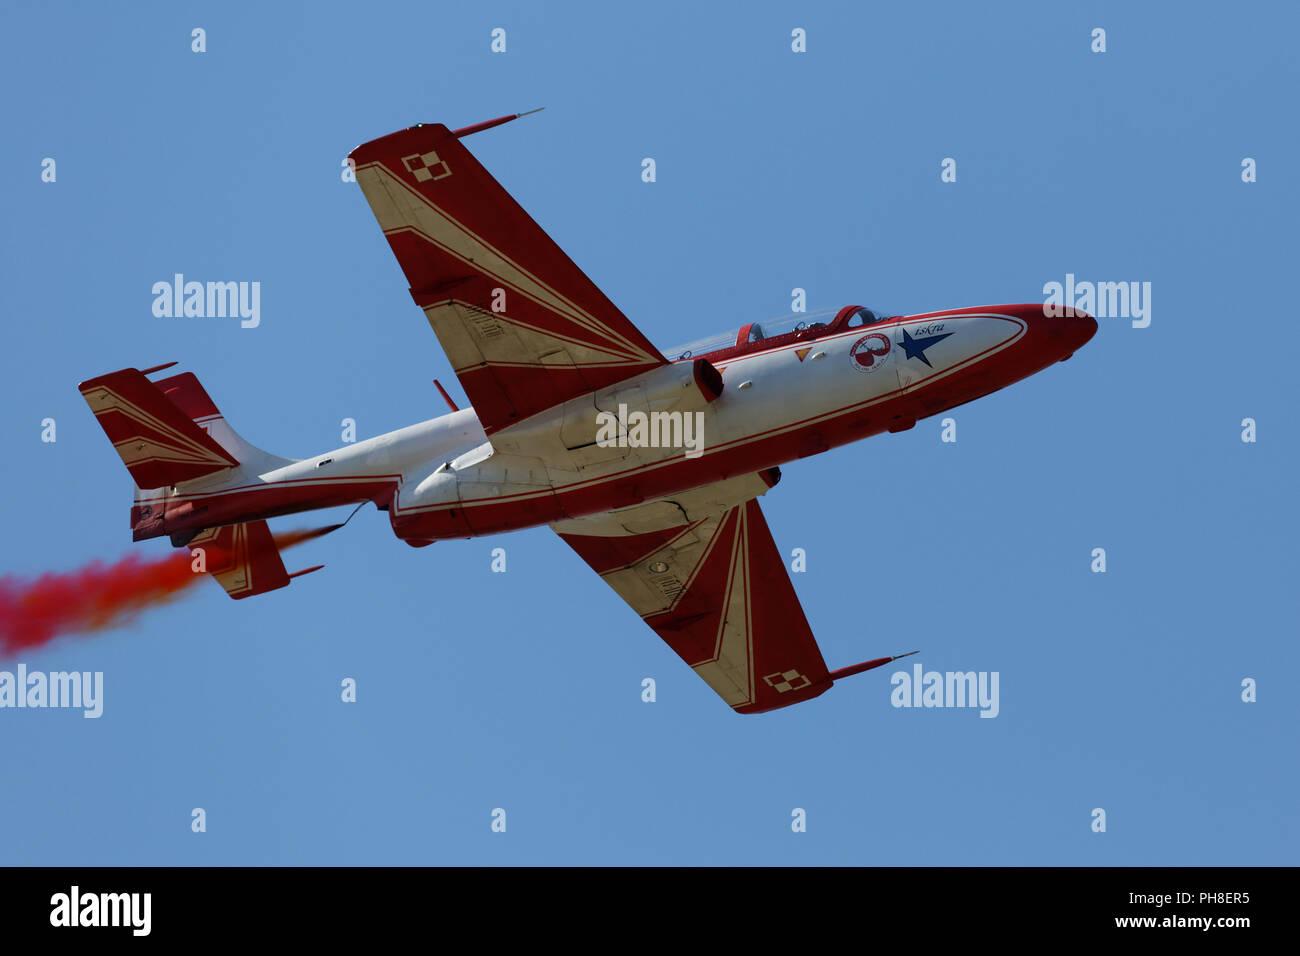 20. CIAF 2013:PZL TS-11 Iskra der polnischen Kunsflugstaffel. Stock Photo